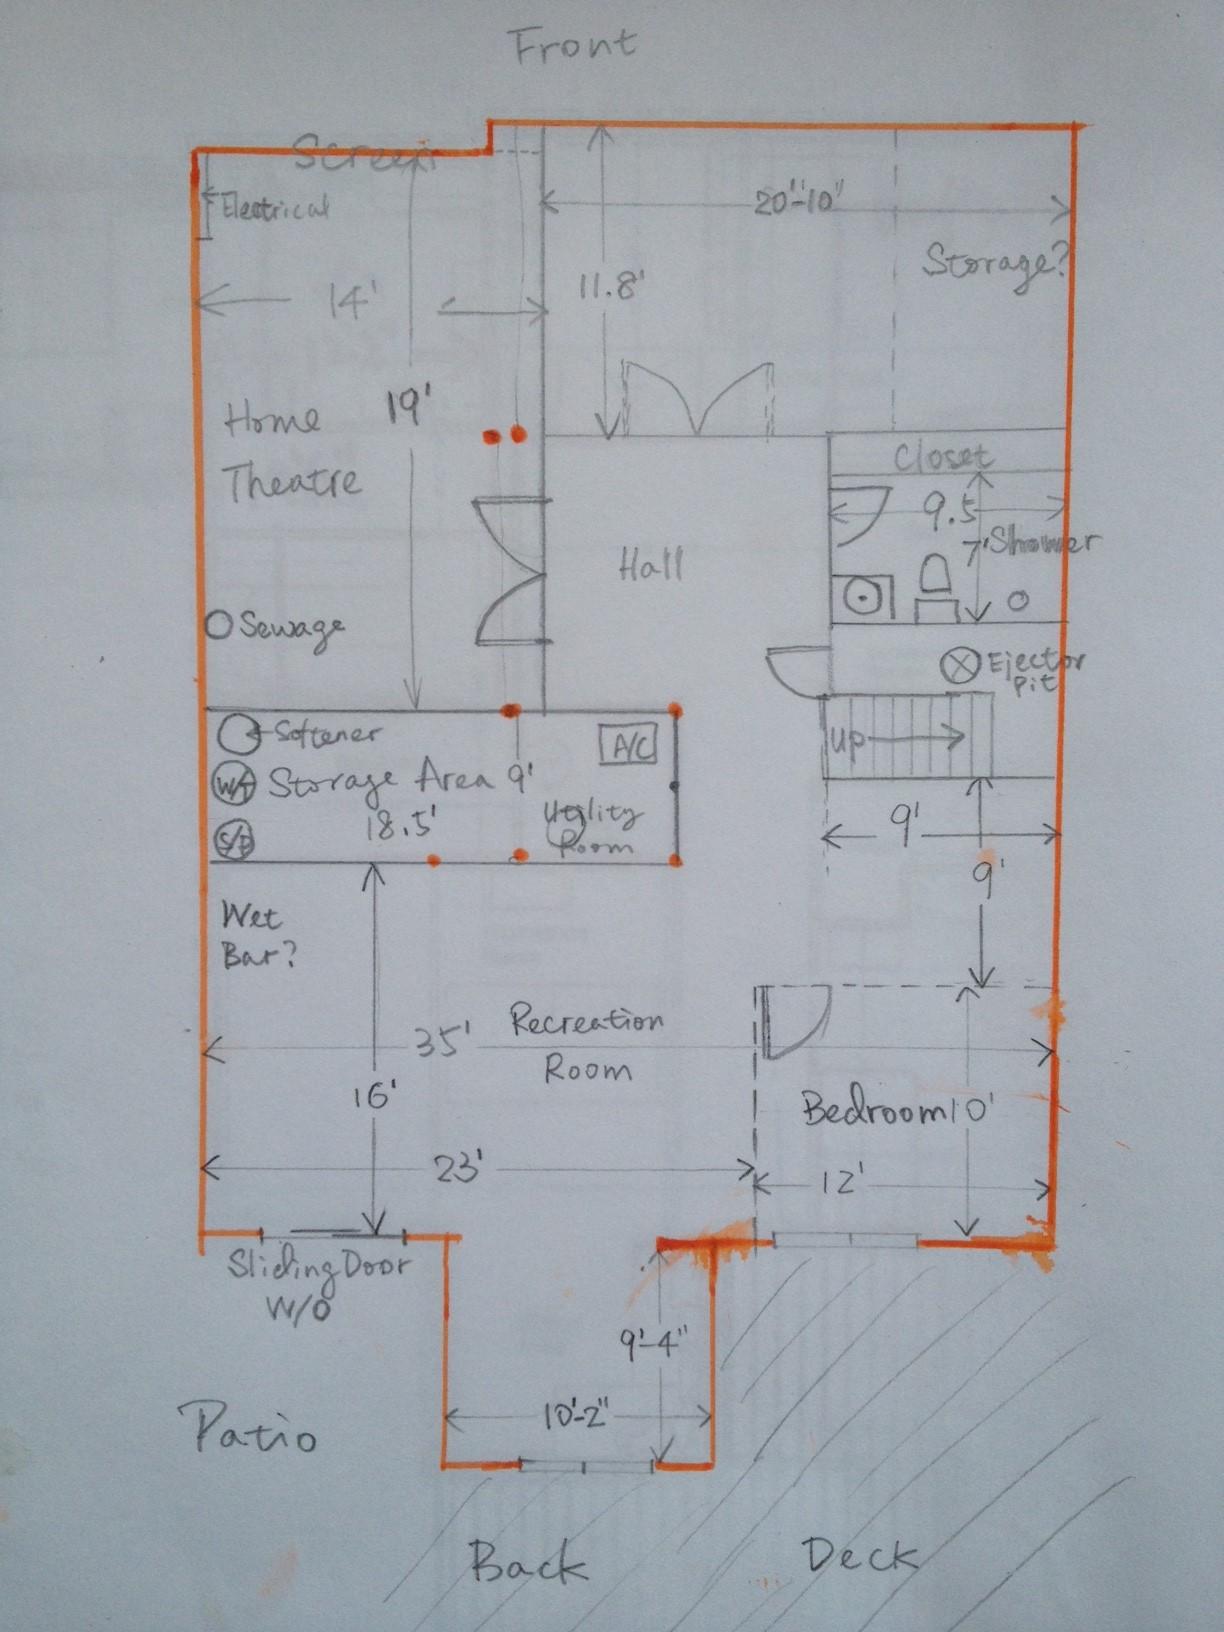 help with my basement floorplan please! (floor, ceiling, shower